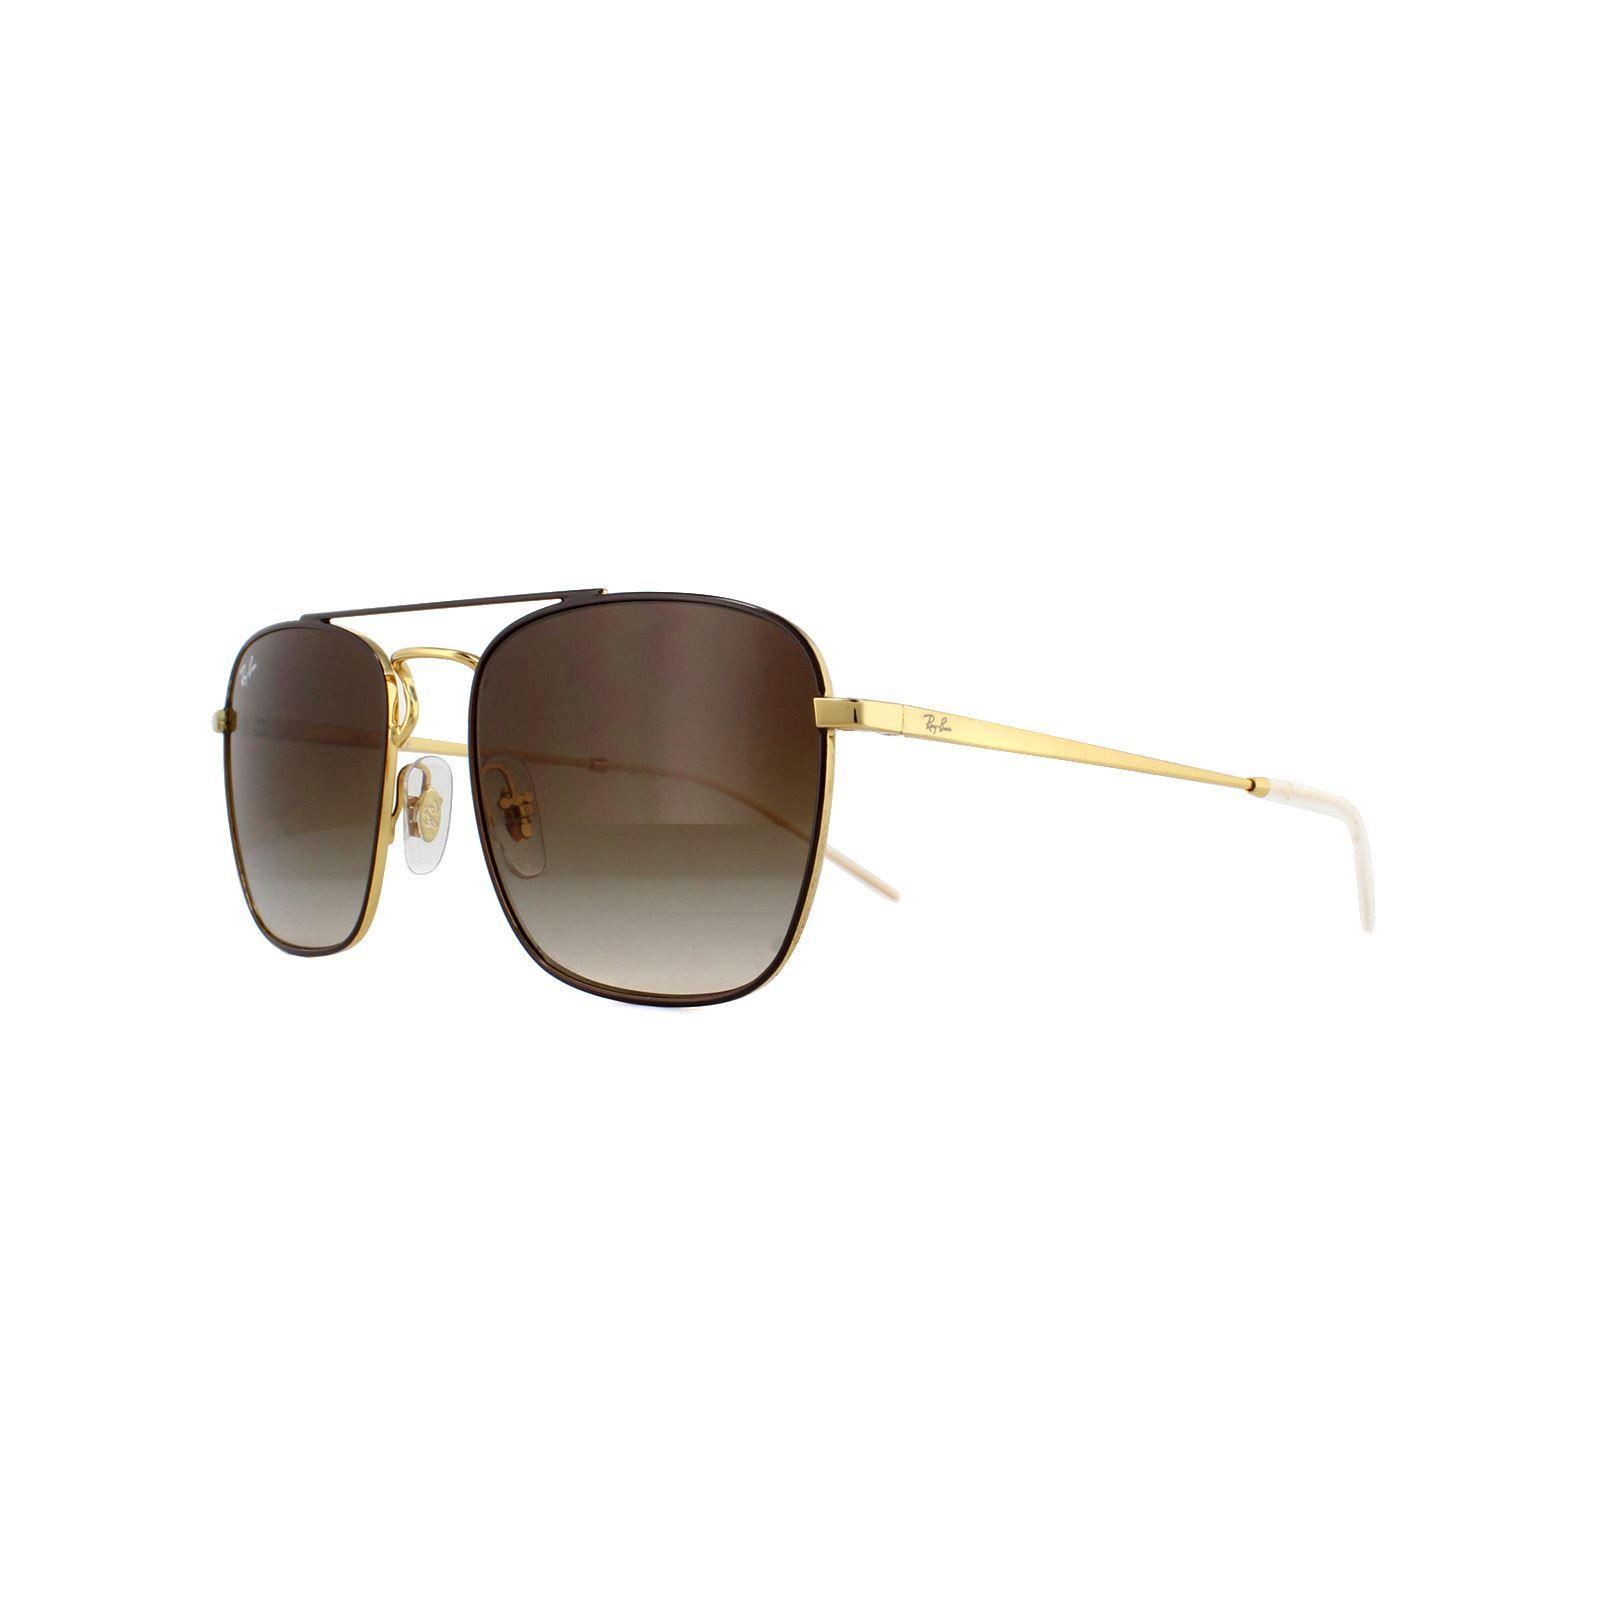 Ray-Ban Sunglasses 3588 905513 Gold Top On Brown Brown Gradient Dark Brown